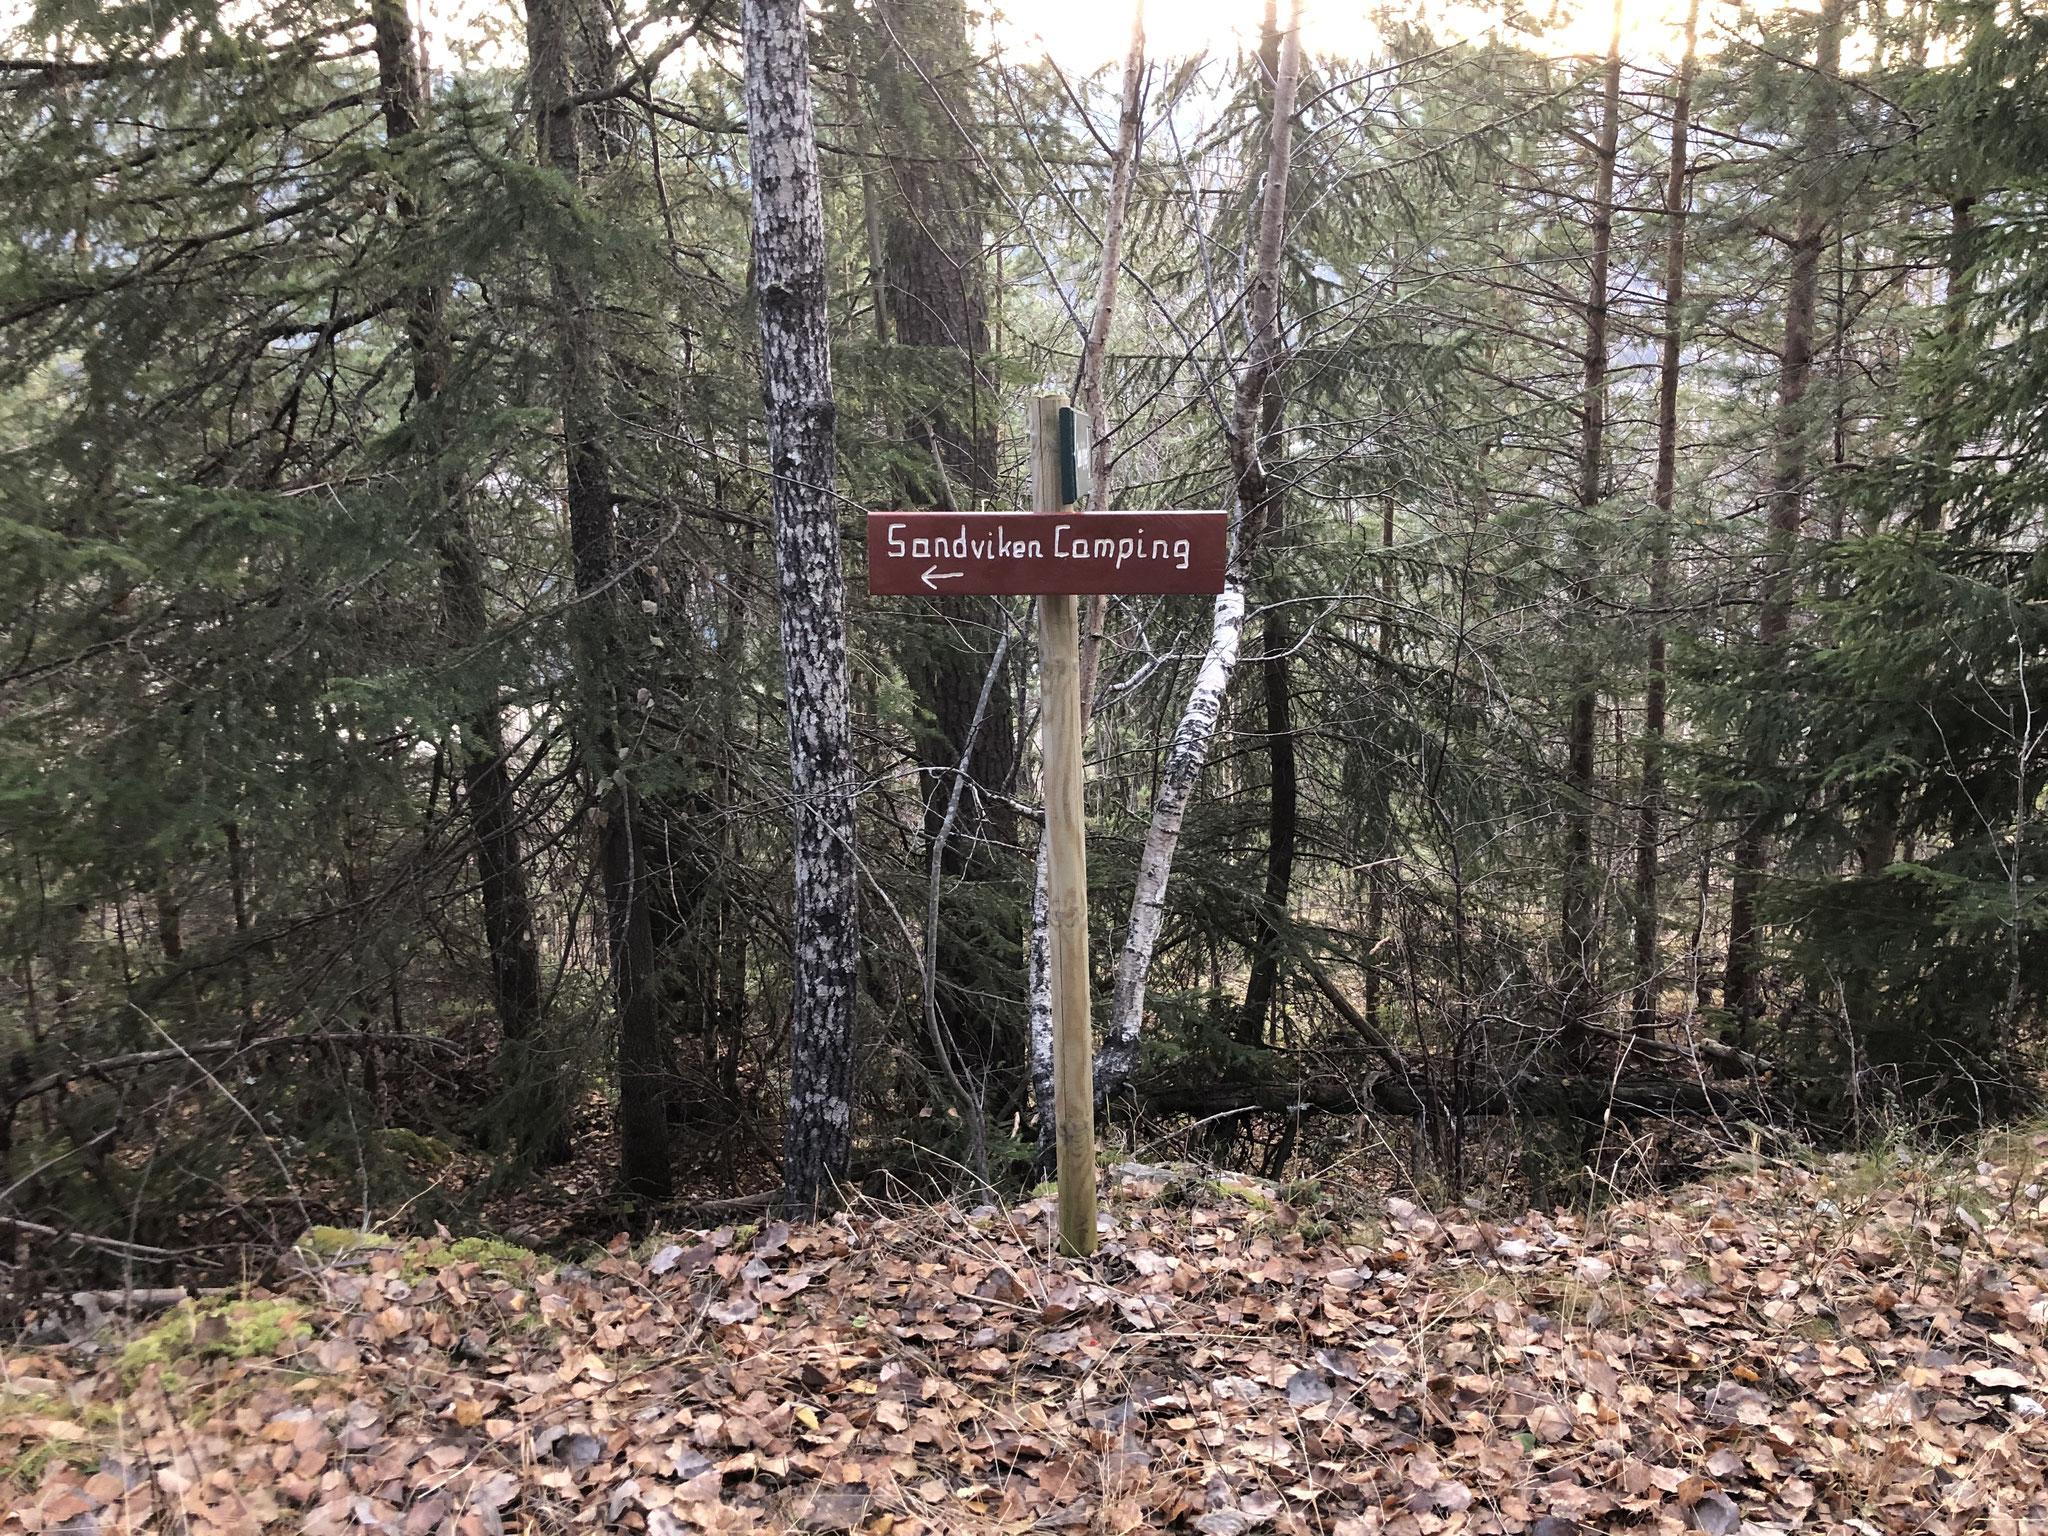 here you turn left back to Sandviken campsite